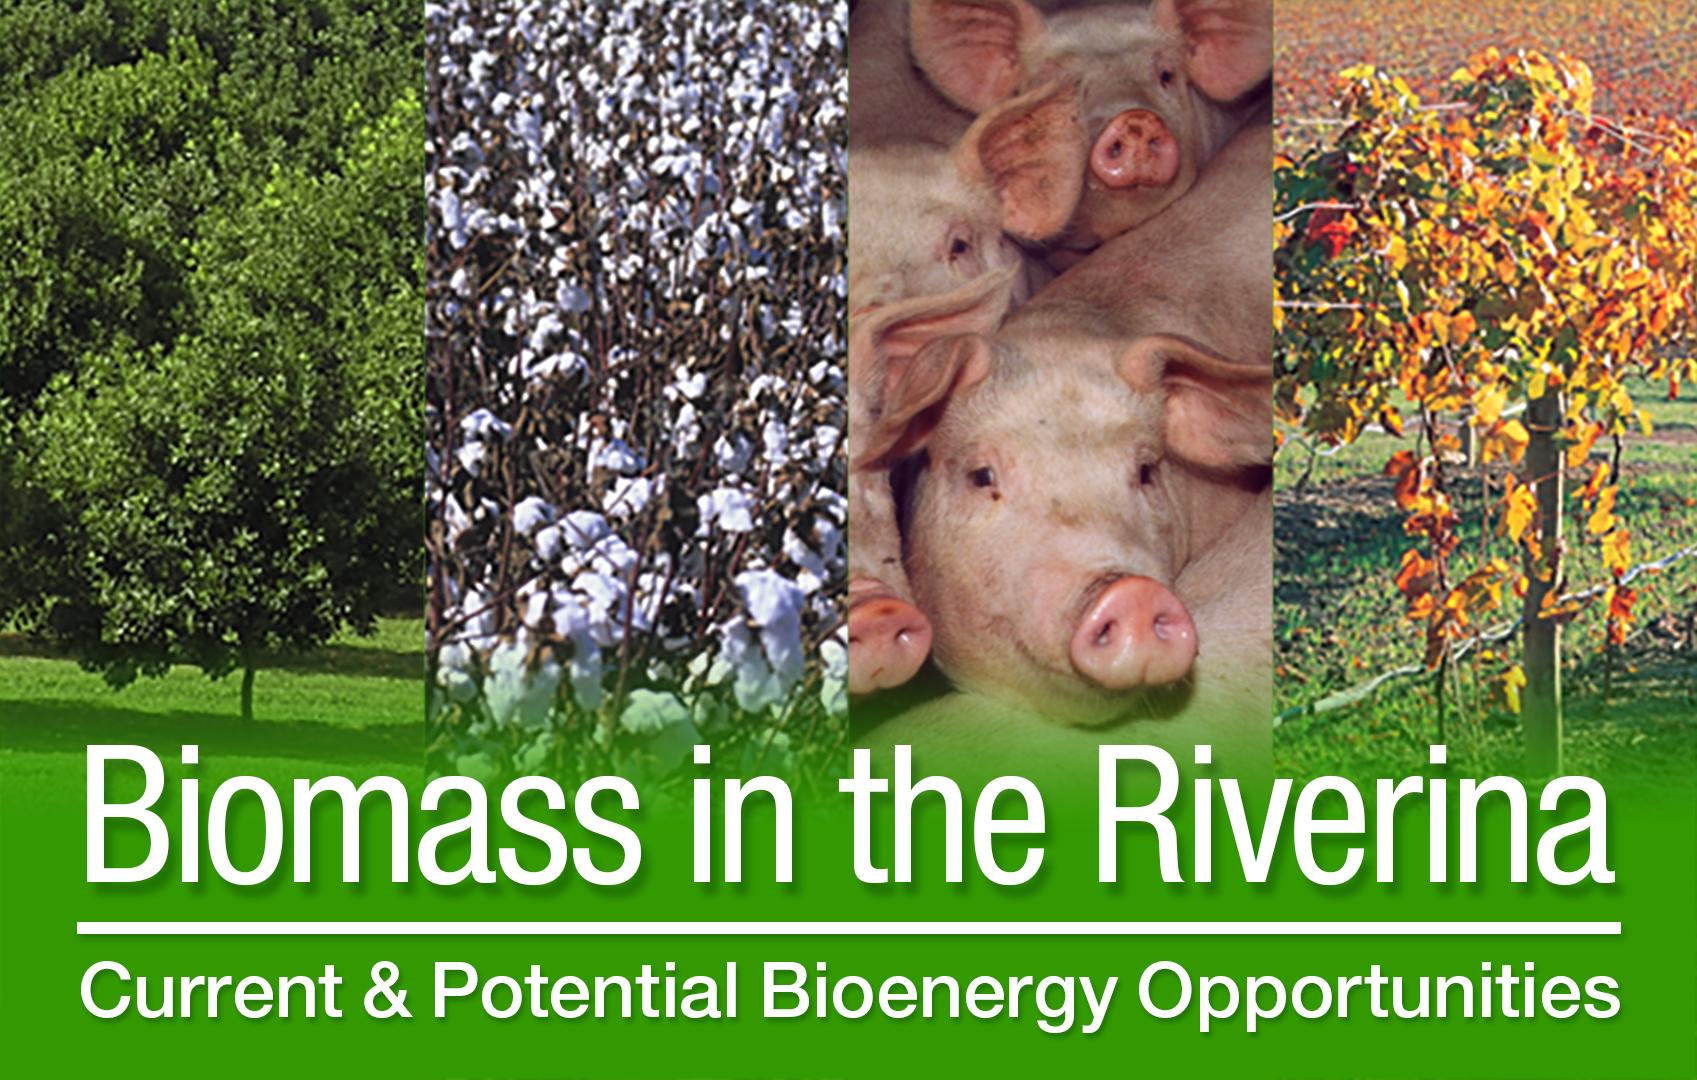 Biomass-Riverina-Forum-header-high-res.jpg